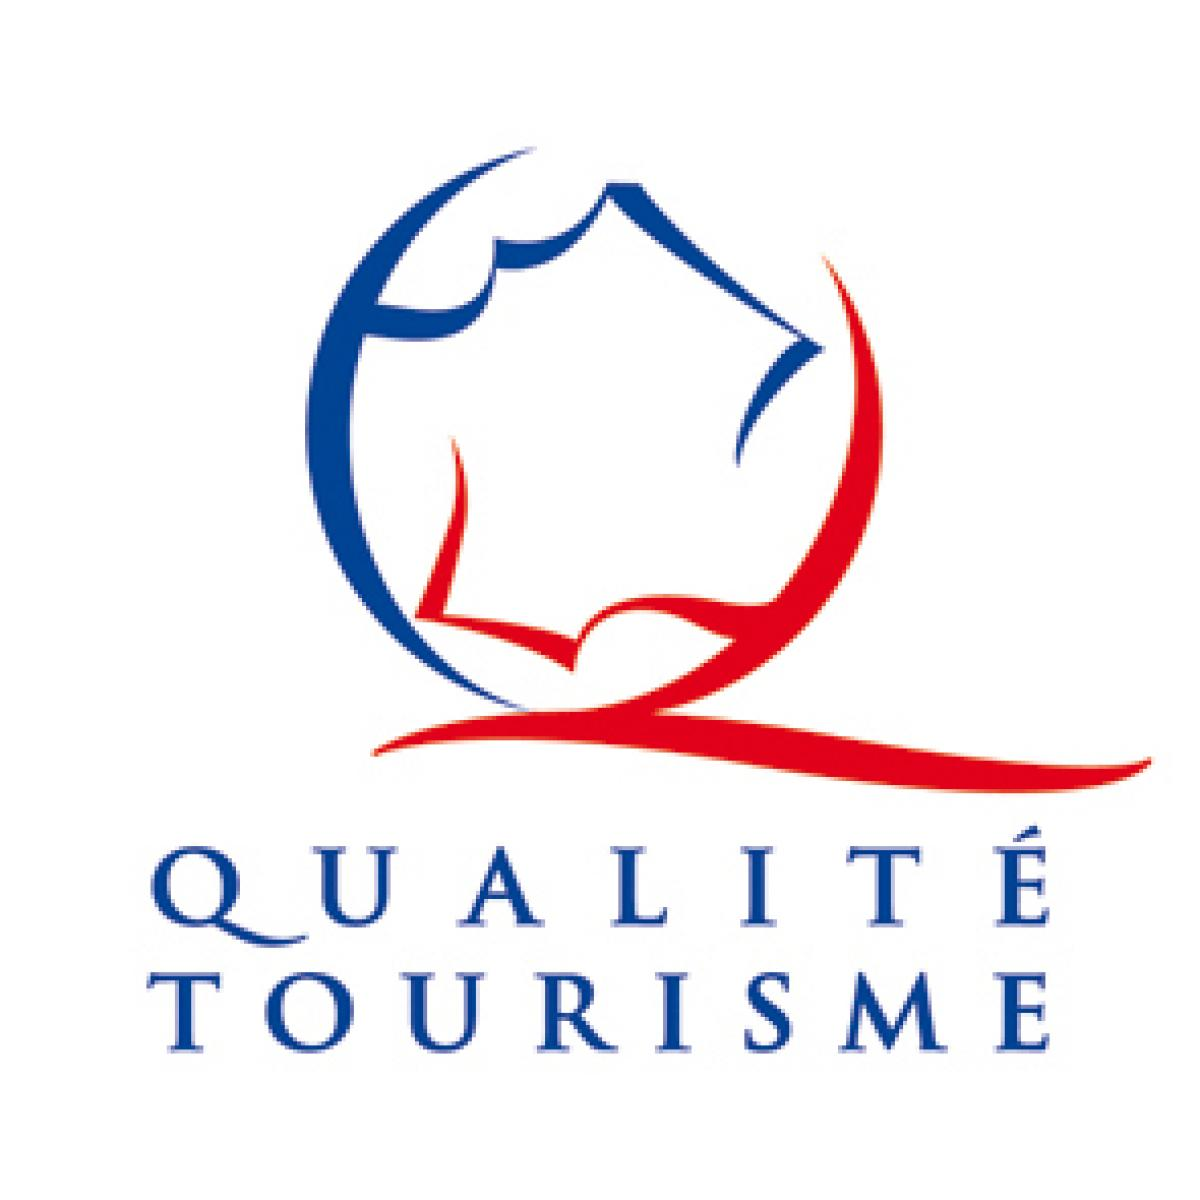 Hotel qualité tourisme